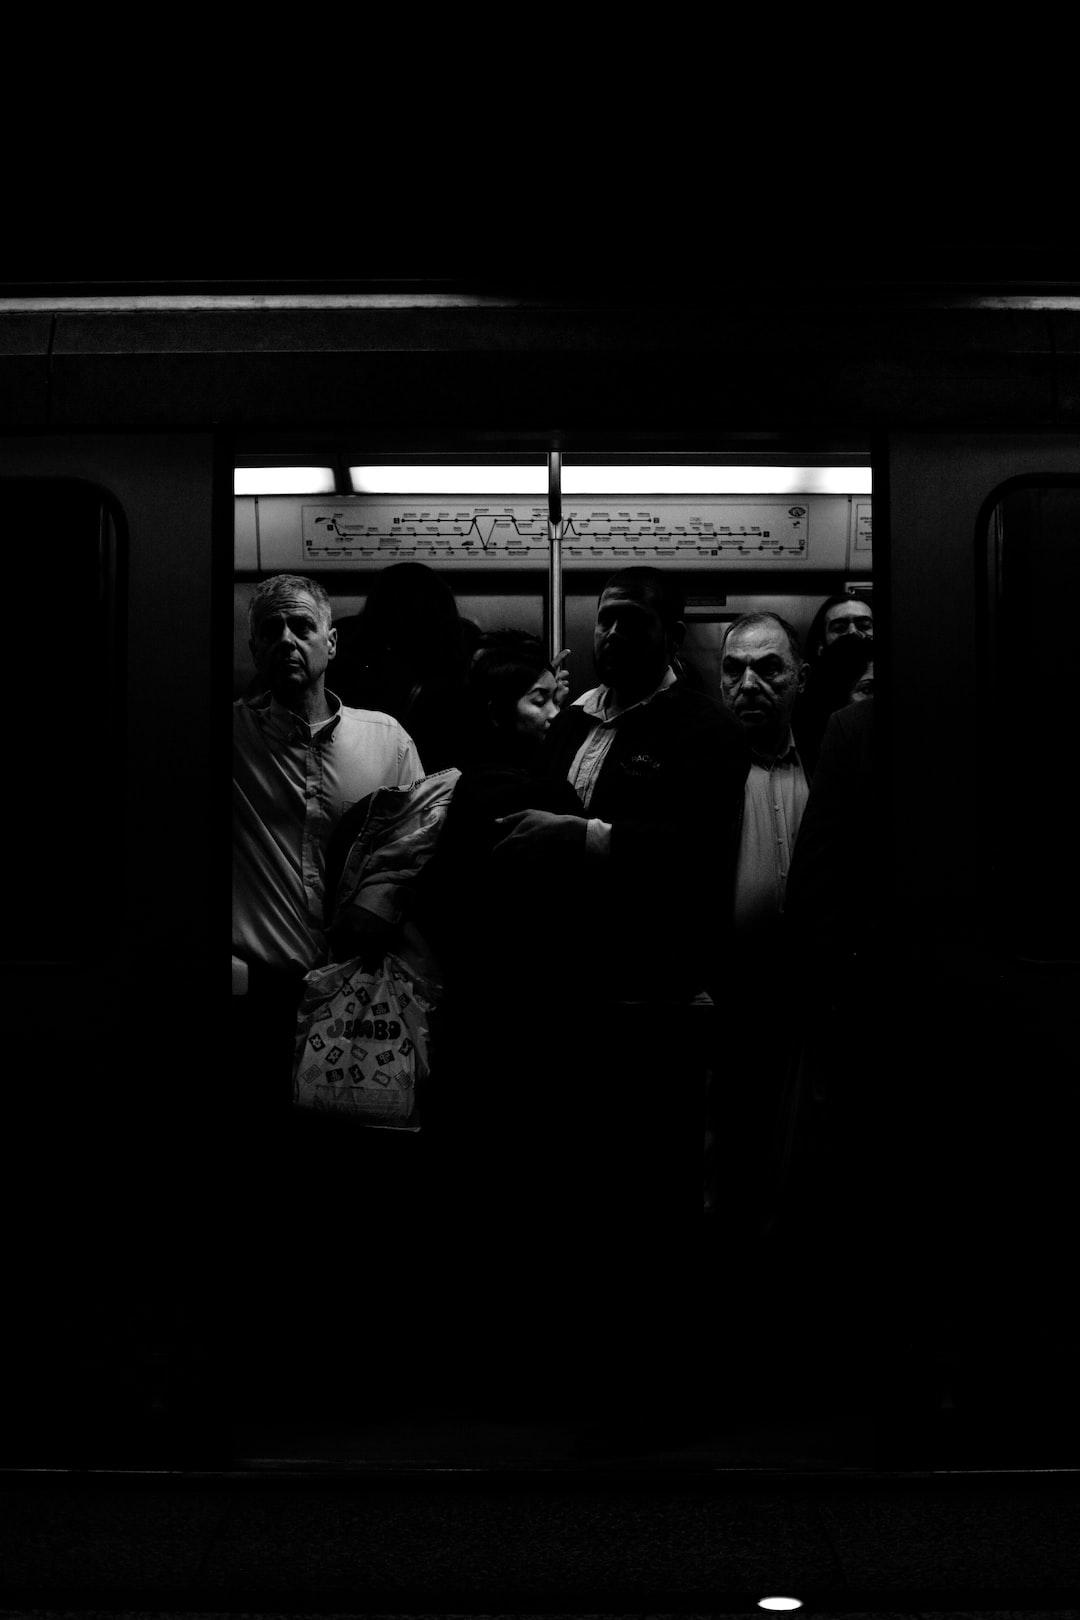 Godfather's subway